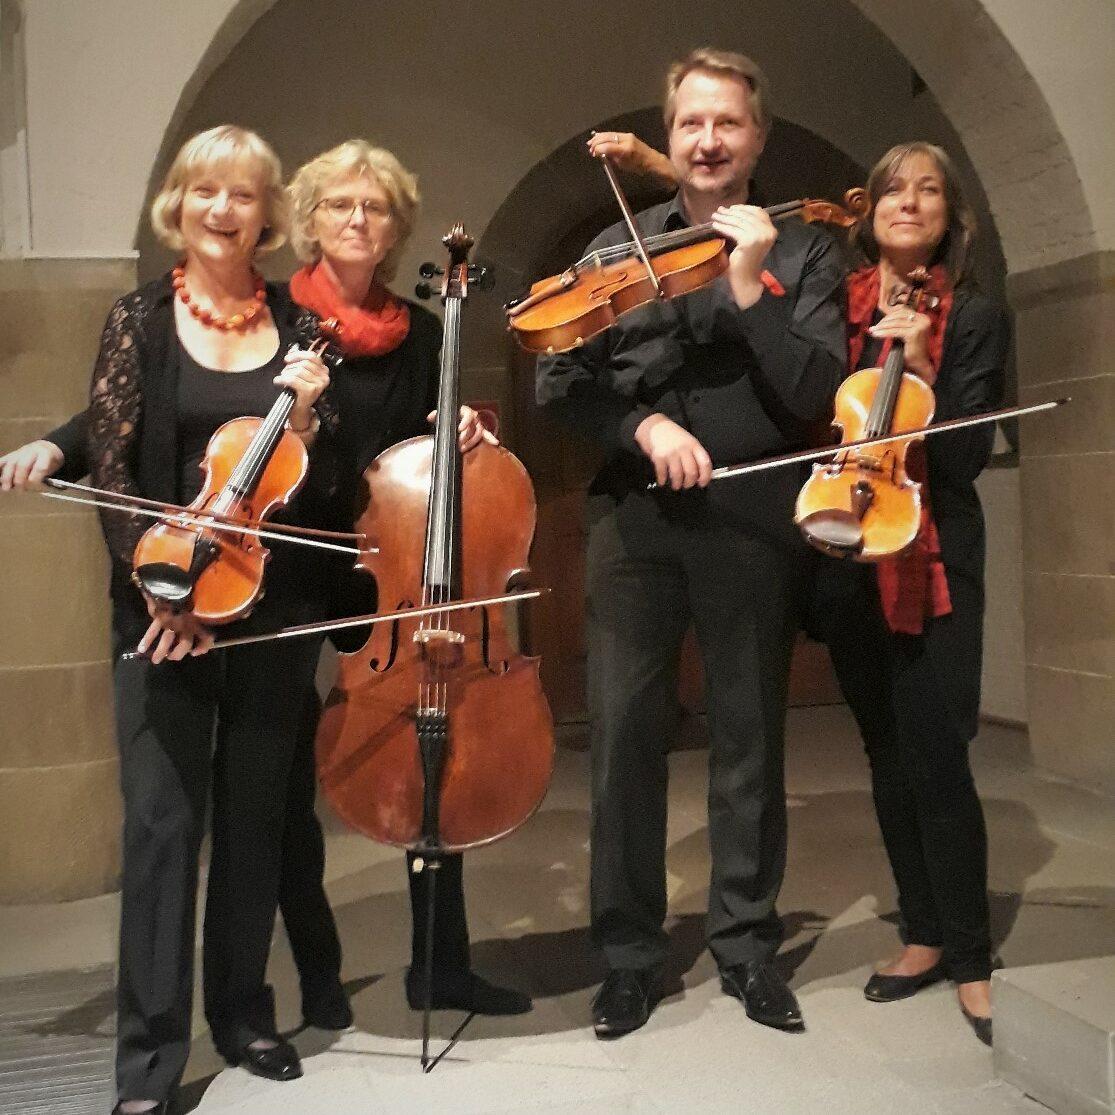 Paul-Gerhardt-Kammerorchester -coronagerecht als Streichquartett